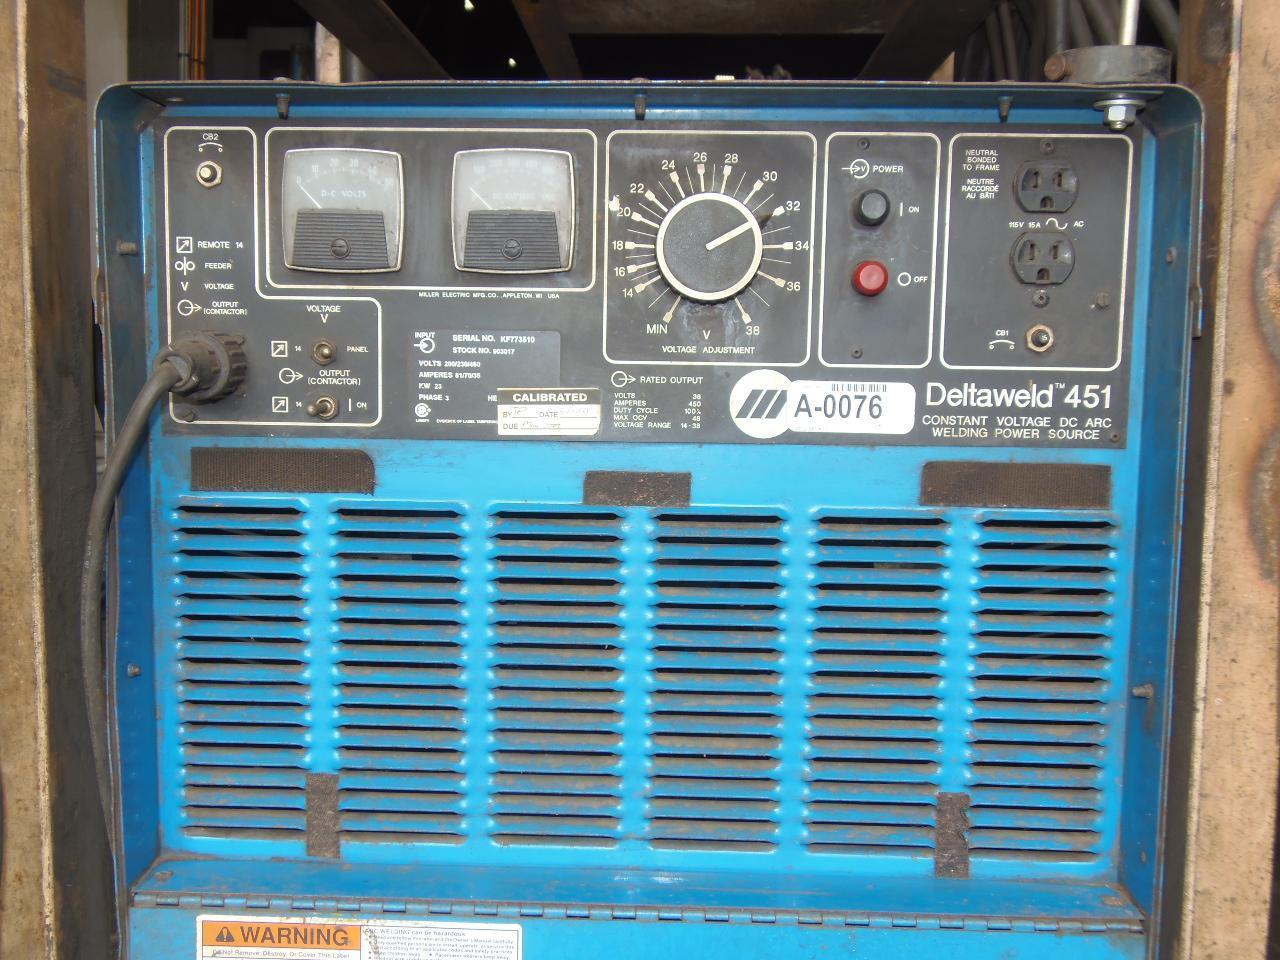 Miller 450 Amp Wire Feed Welder, Model Deltaweld 451 with D54D Wire feeder